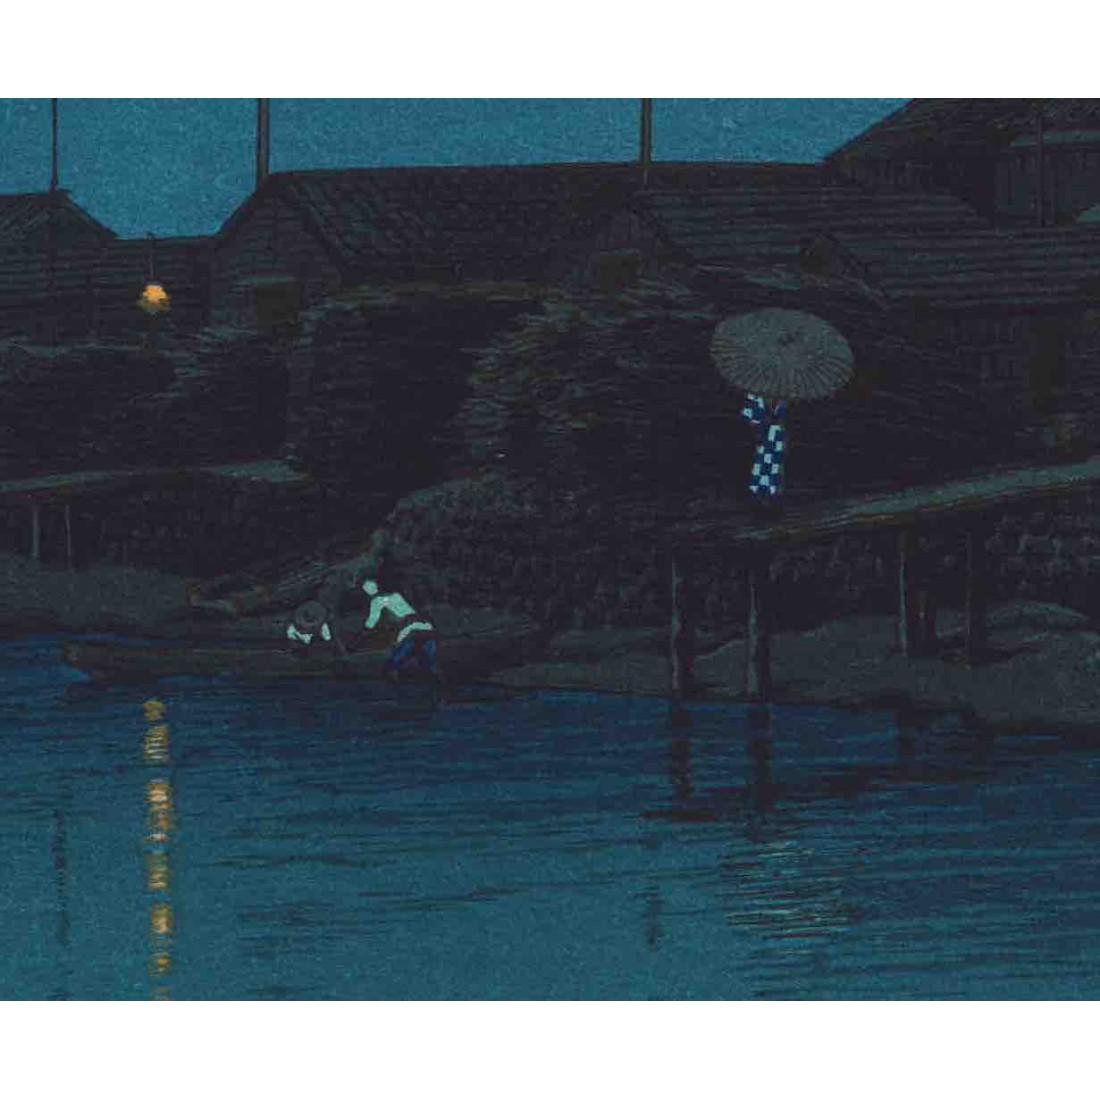 Pluie du soir à Kawarako, Ibaraki